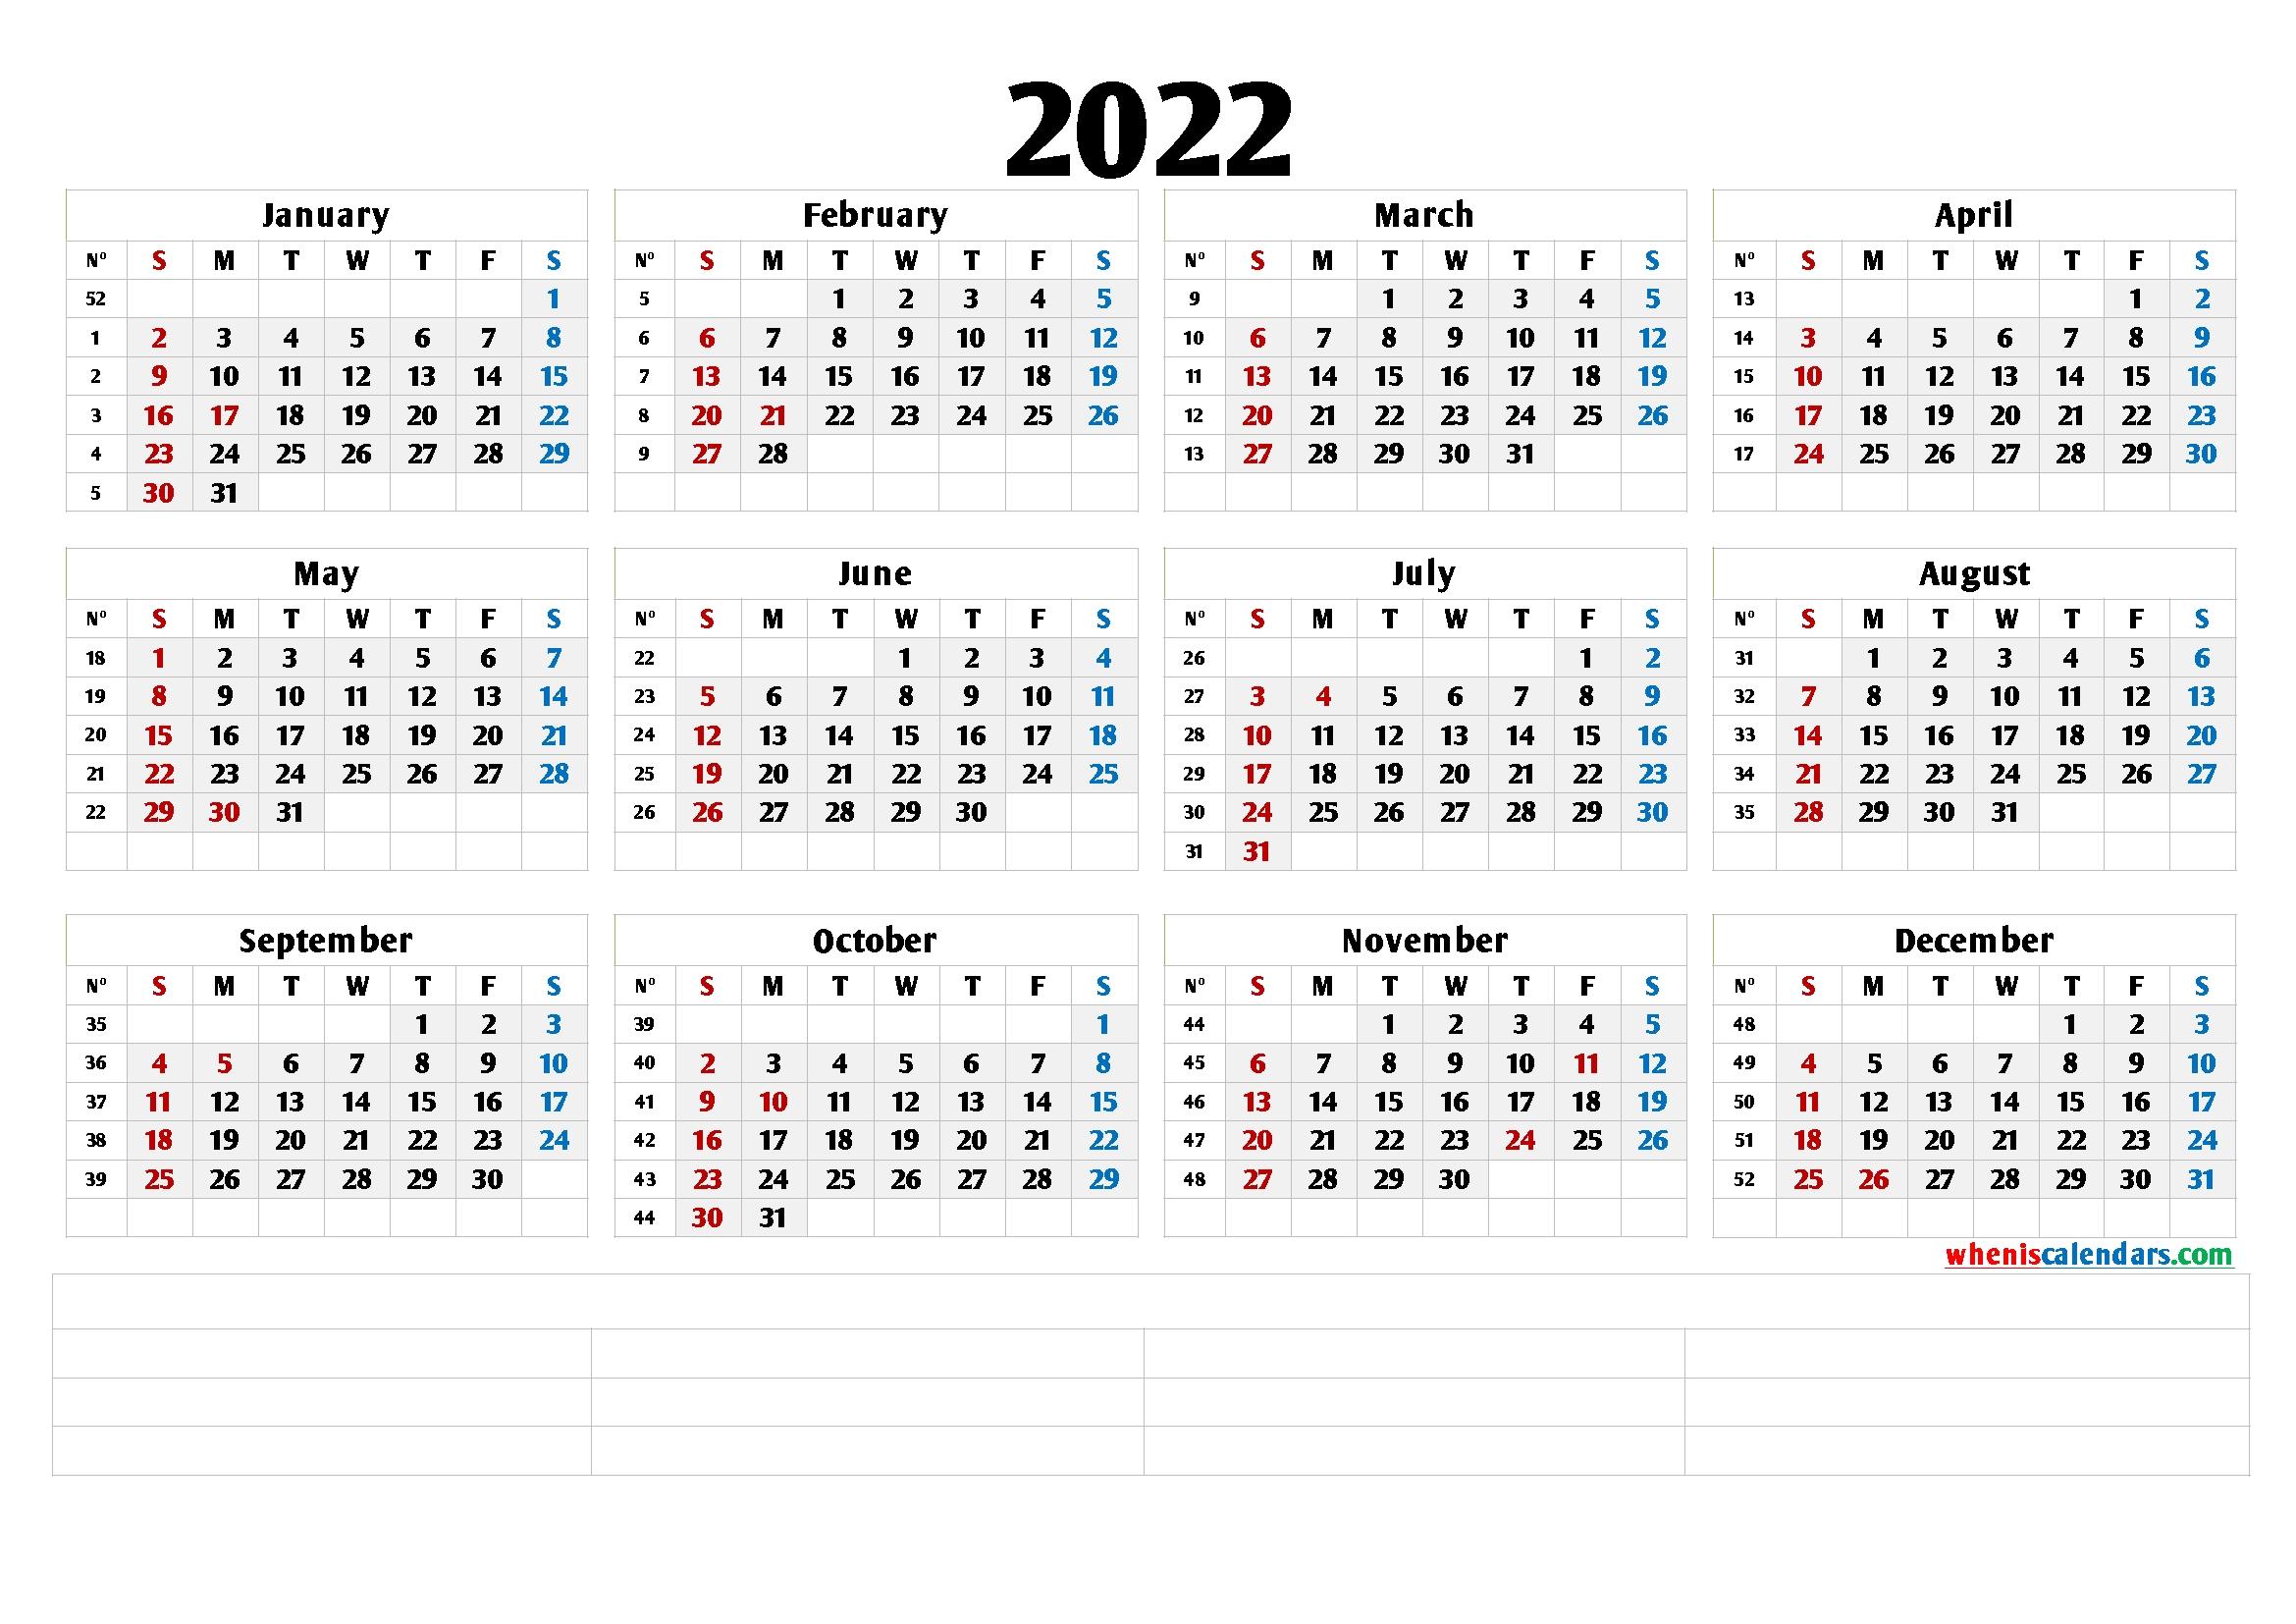 2022 free printable yearly calendar with week numbers 6 templates::Download 2022 Printable Calendar